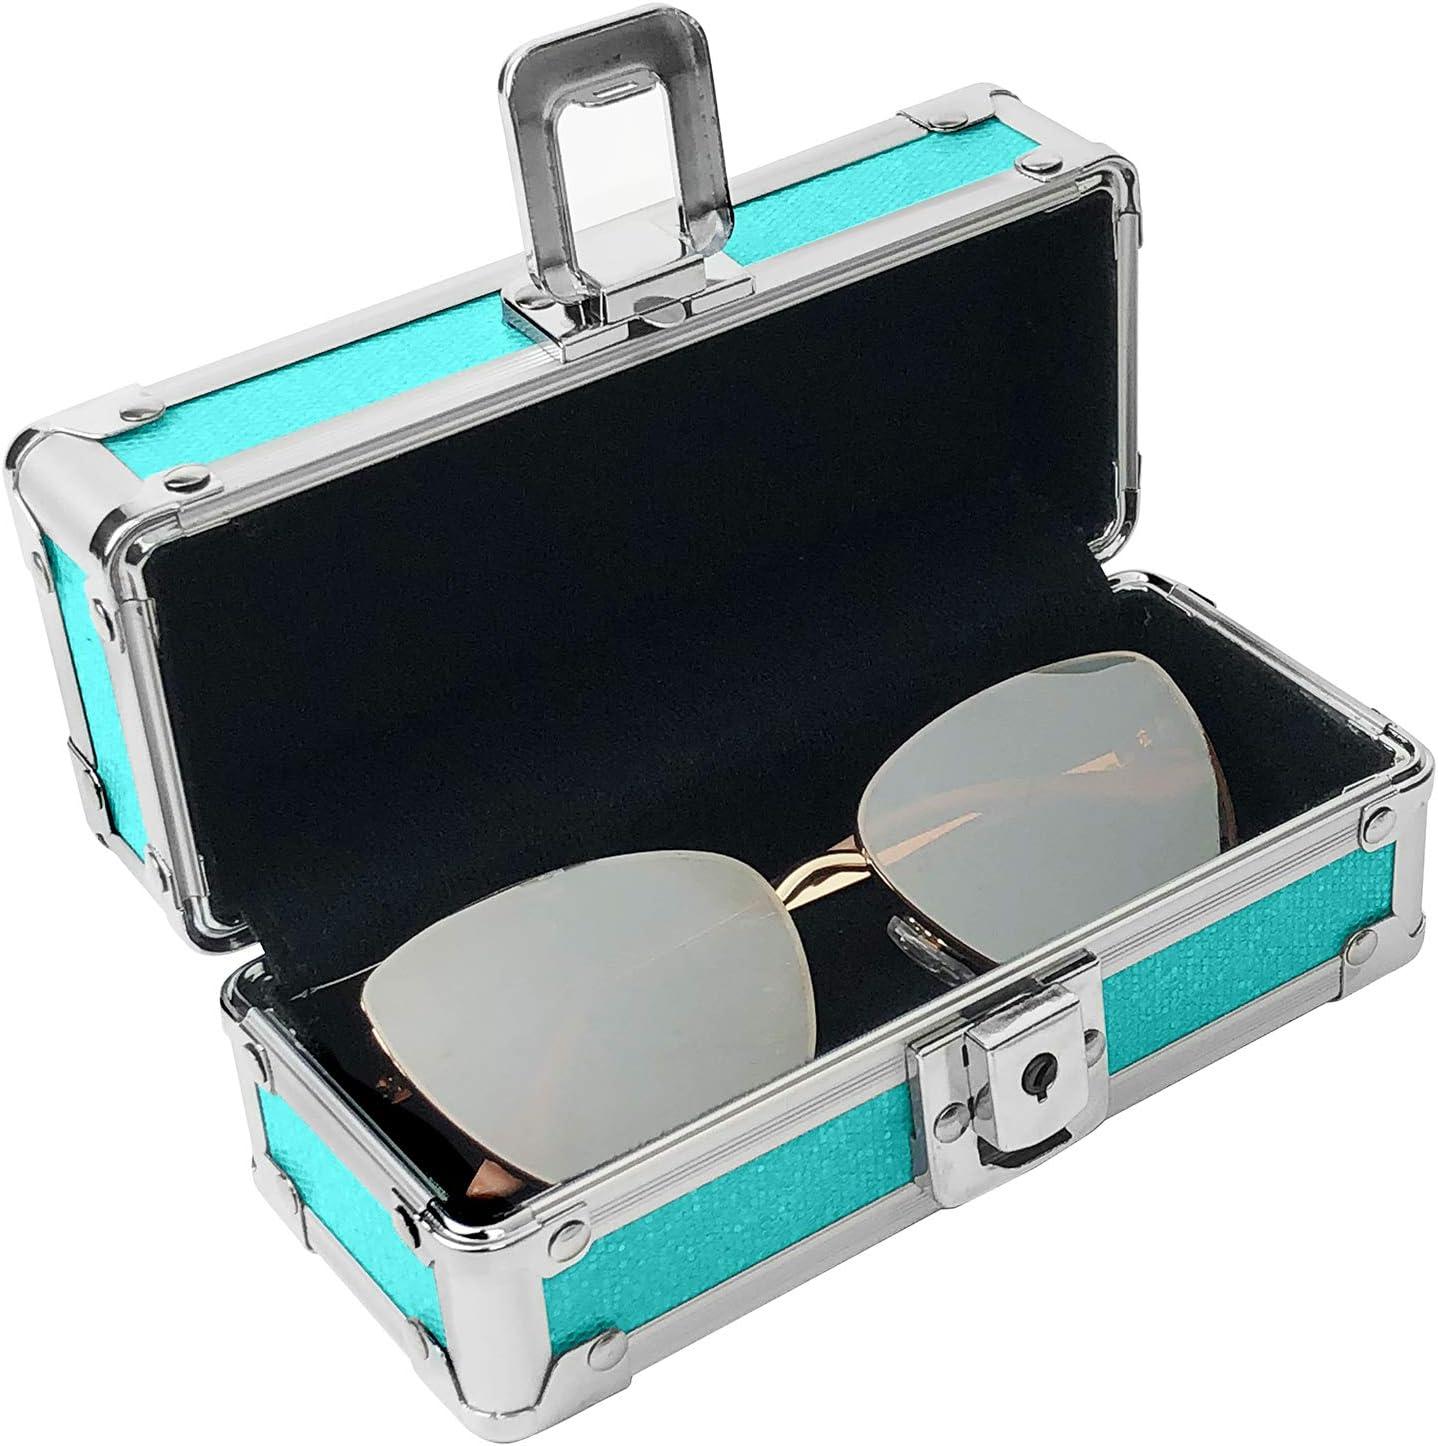 Blue//Teal Sparkles Vaultz Locking Sunglass Case